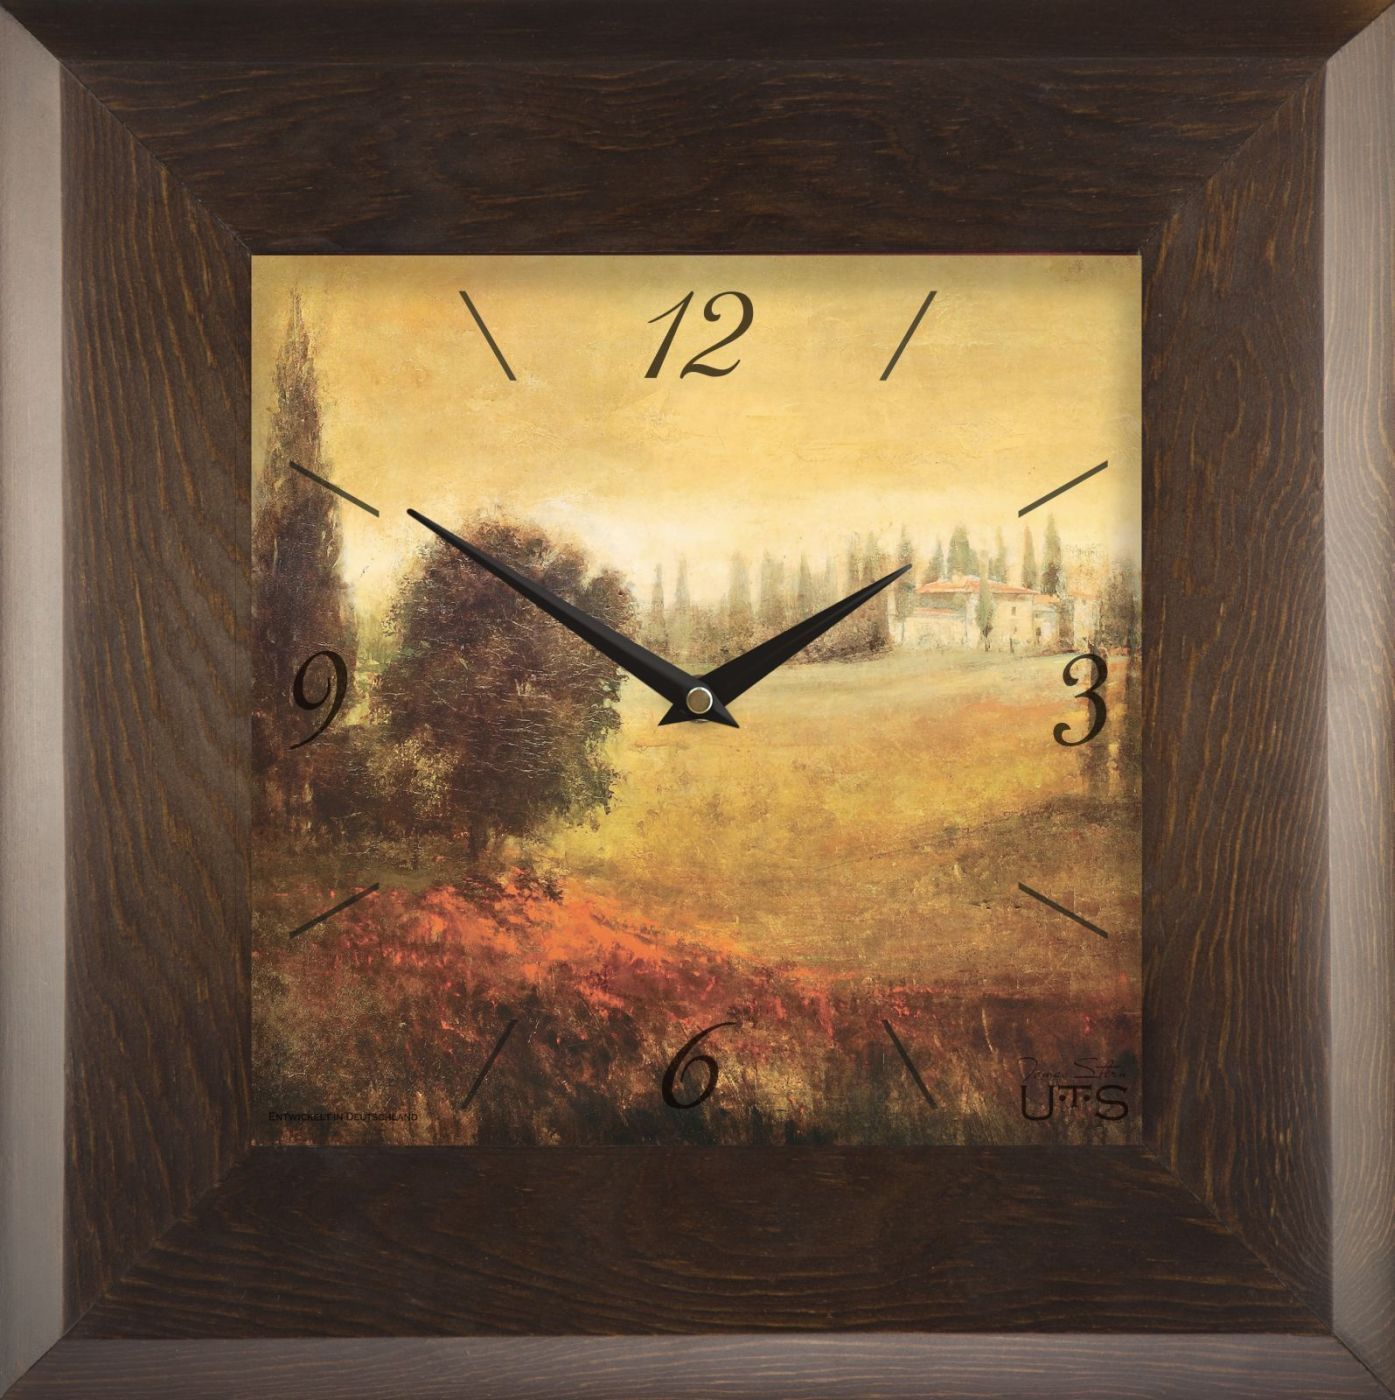 Часы настенные Часы настенные Tomas Stern 7004 chasy-nastennye-tomas-stern-7004-germaniya-tayvan.jpg